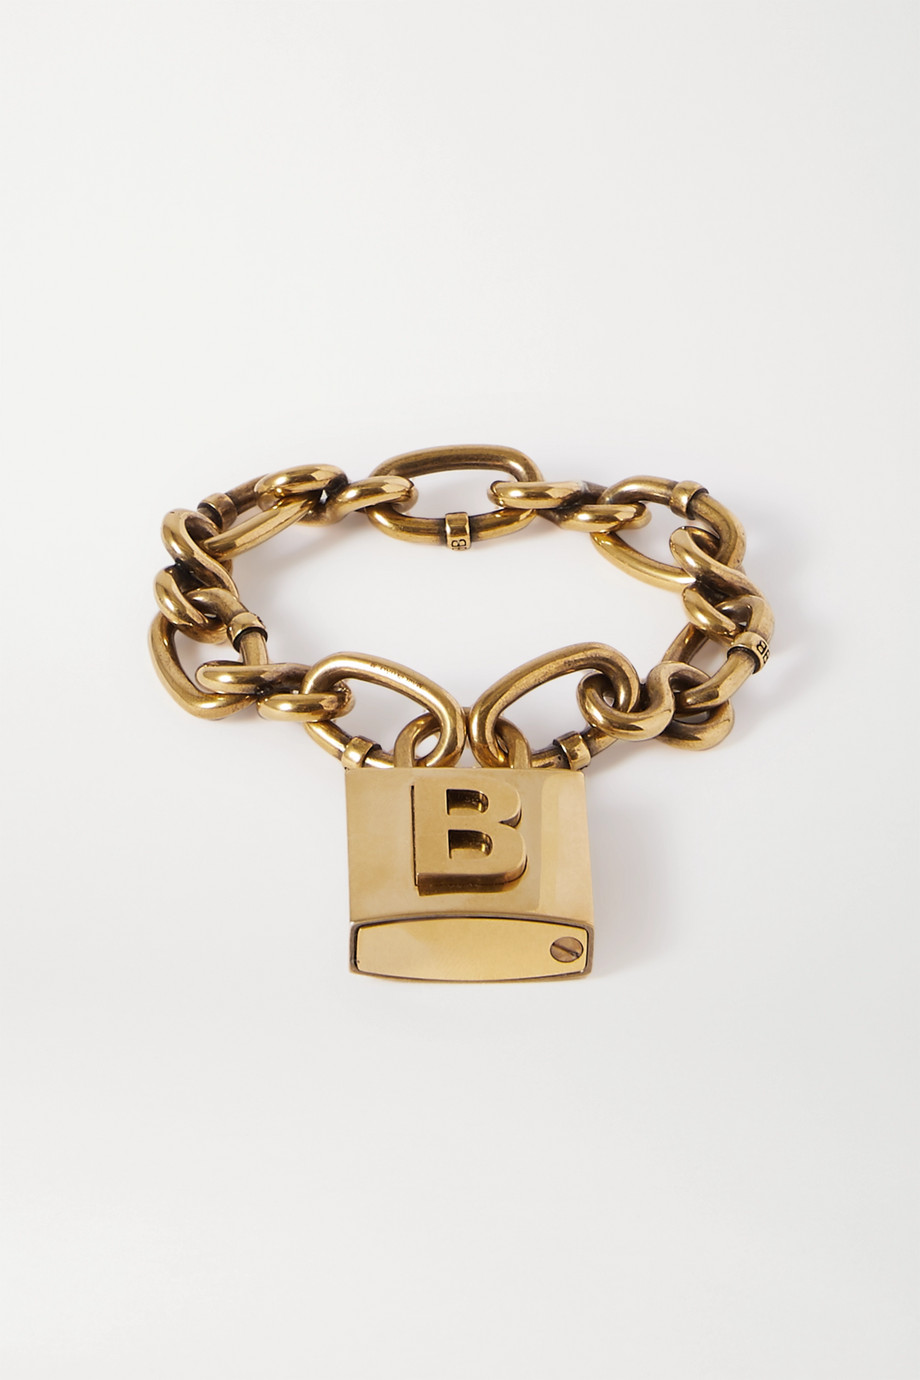 Balenciaga Lock goldfarbenes Armband mit Prägungen